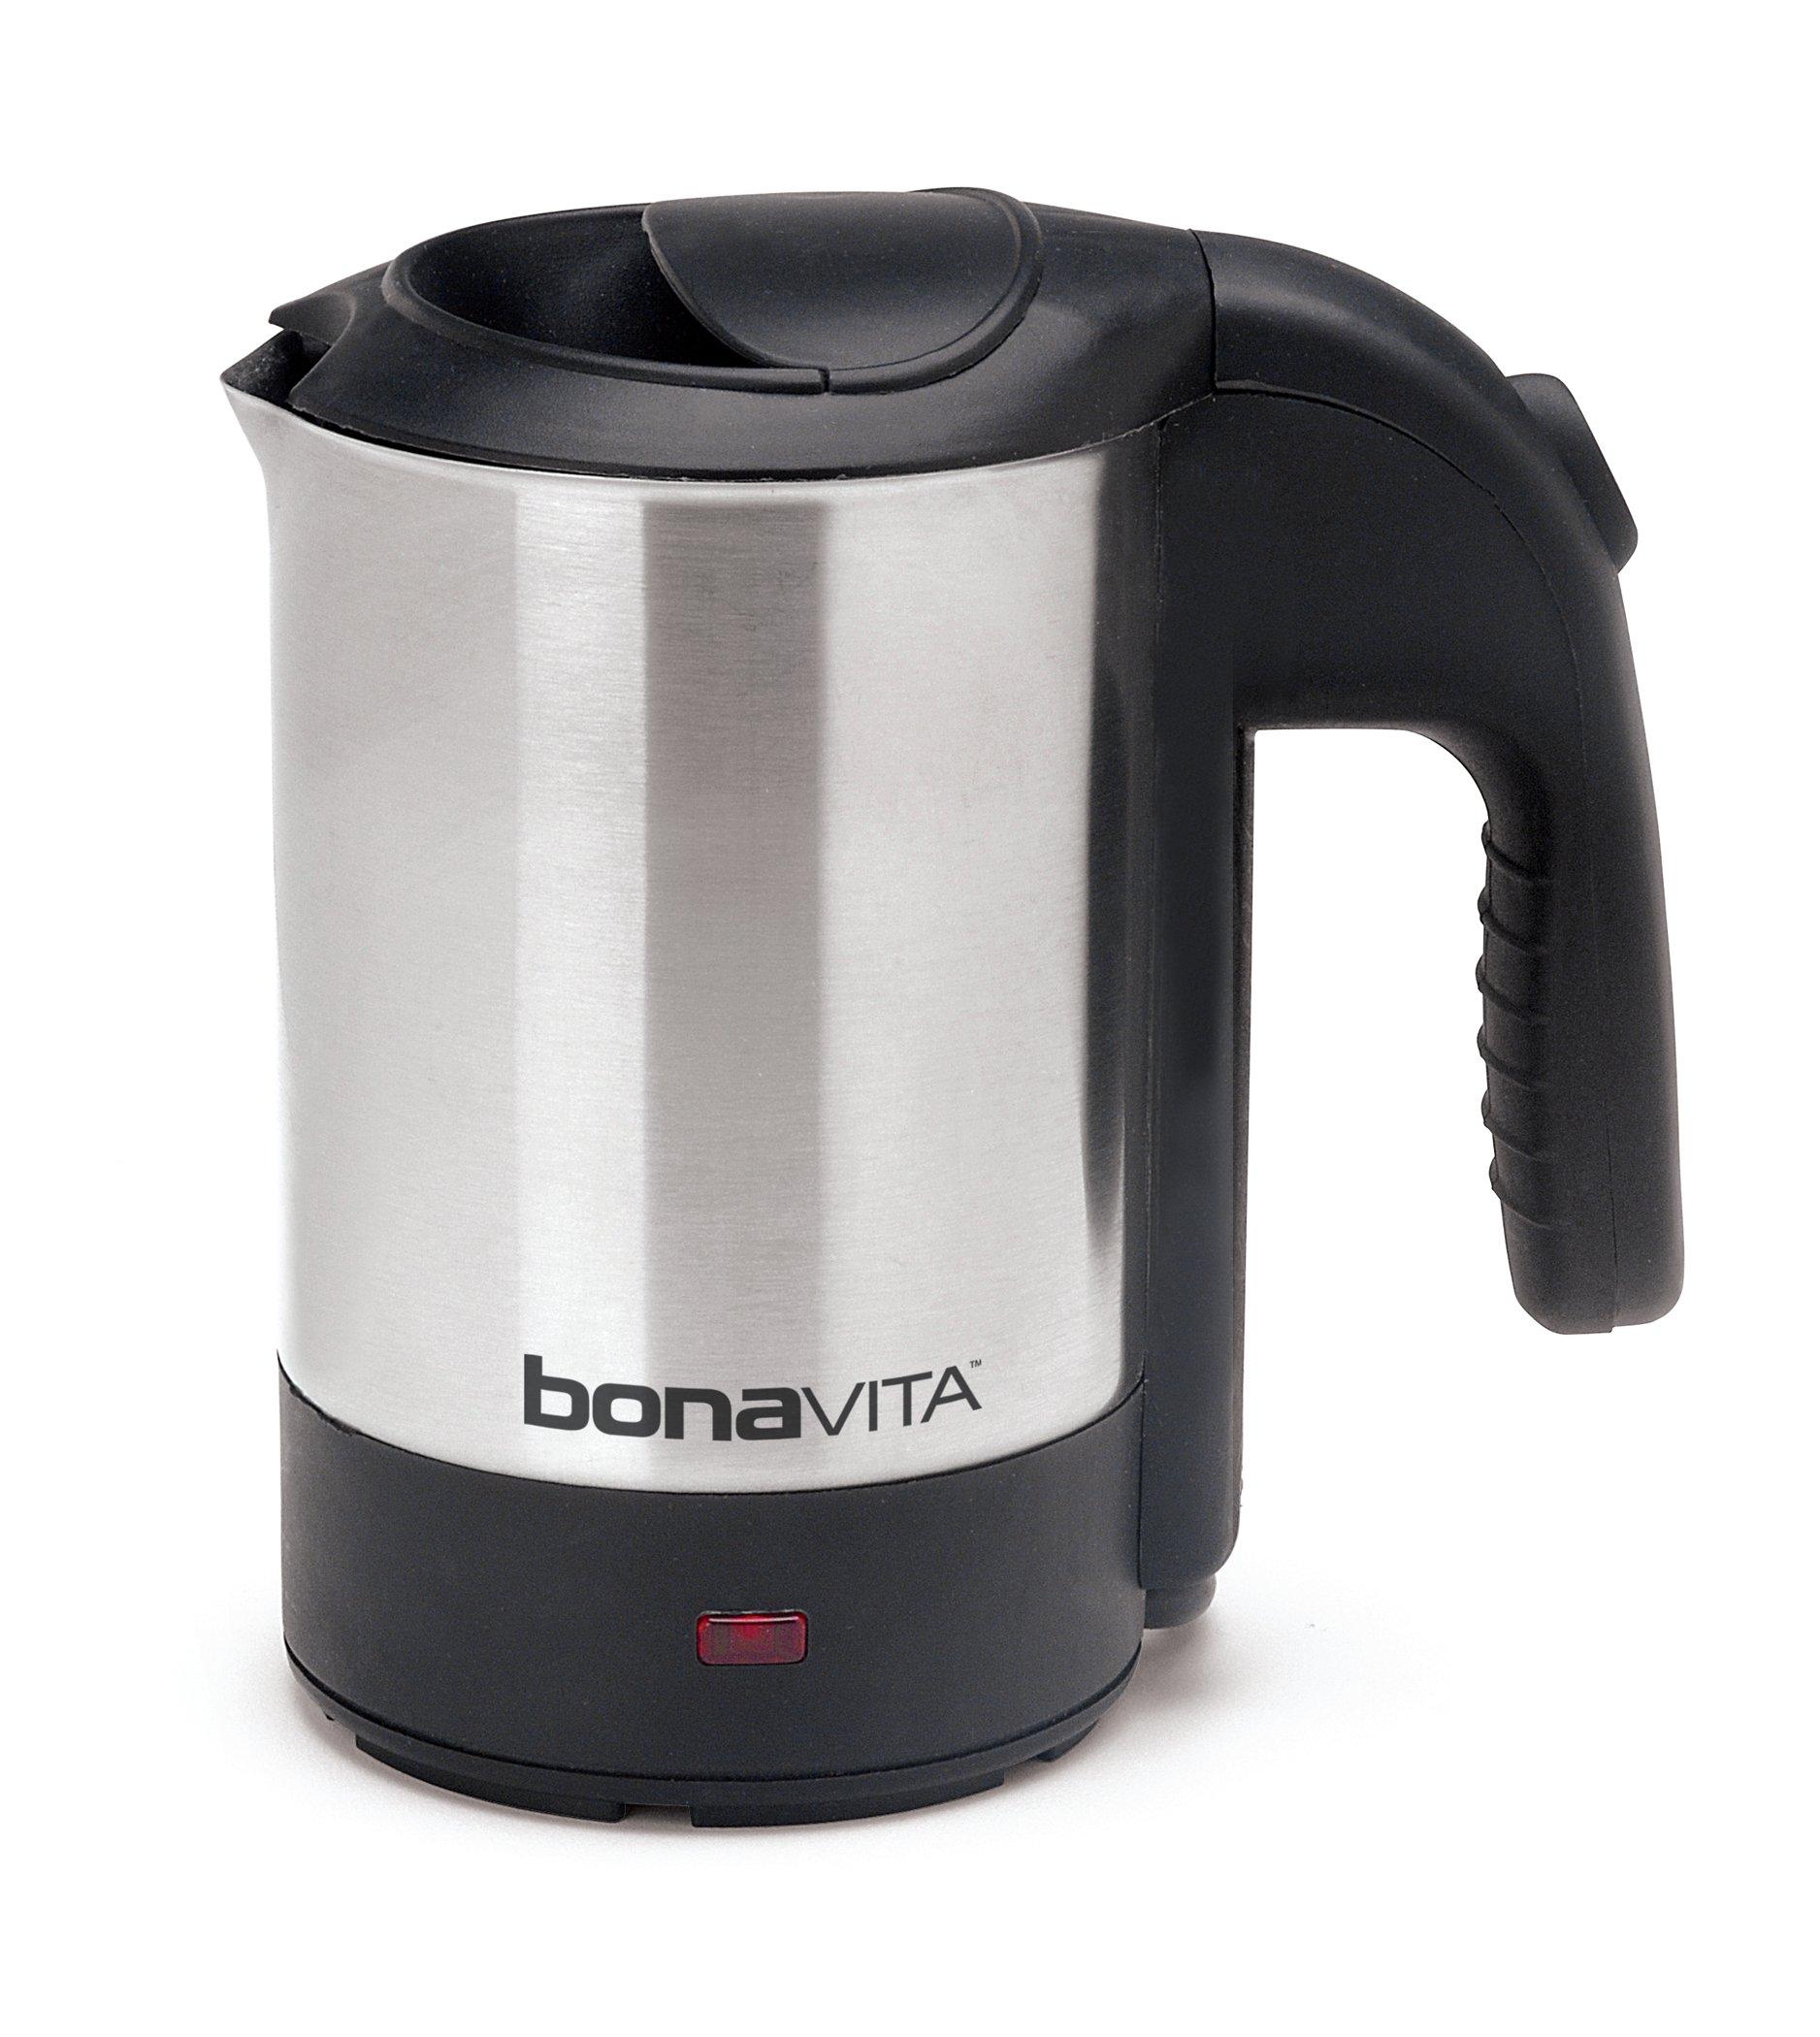 Bonavita 0.5L Mini Kettle, Stainless Steel by Bonavita